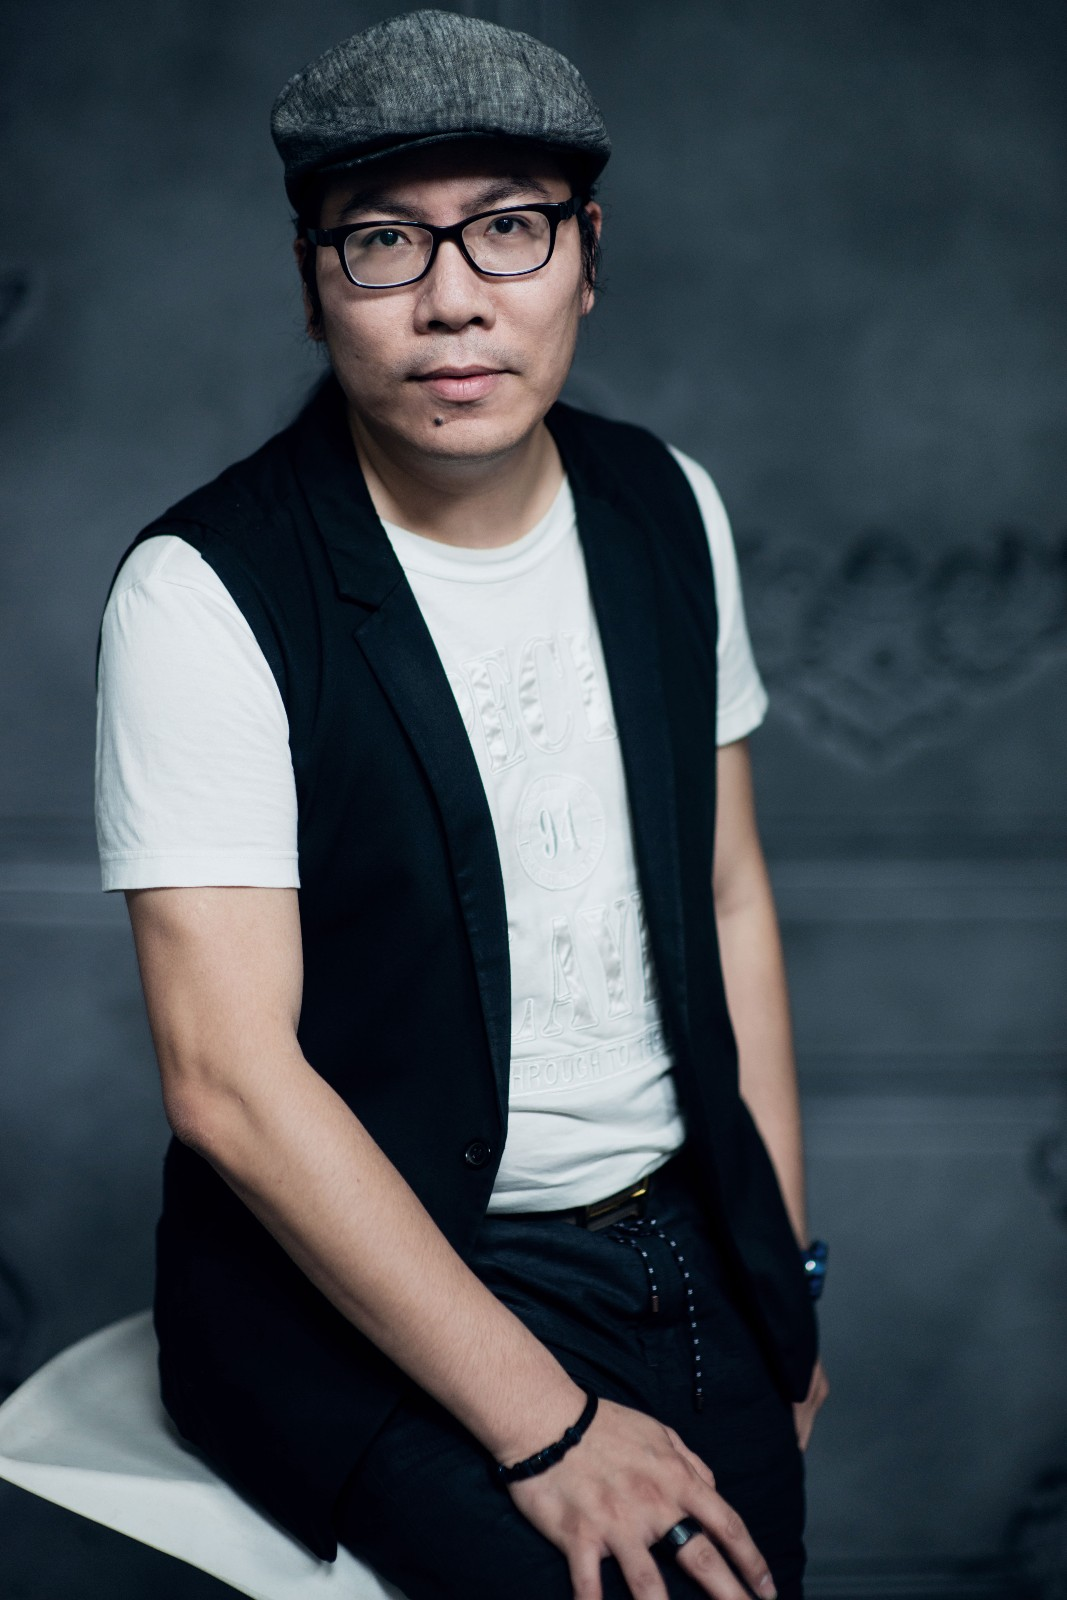 Portrait_Thomas Tse.jpg